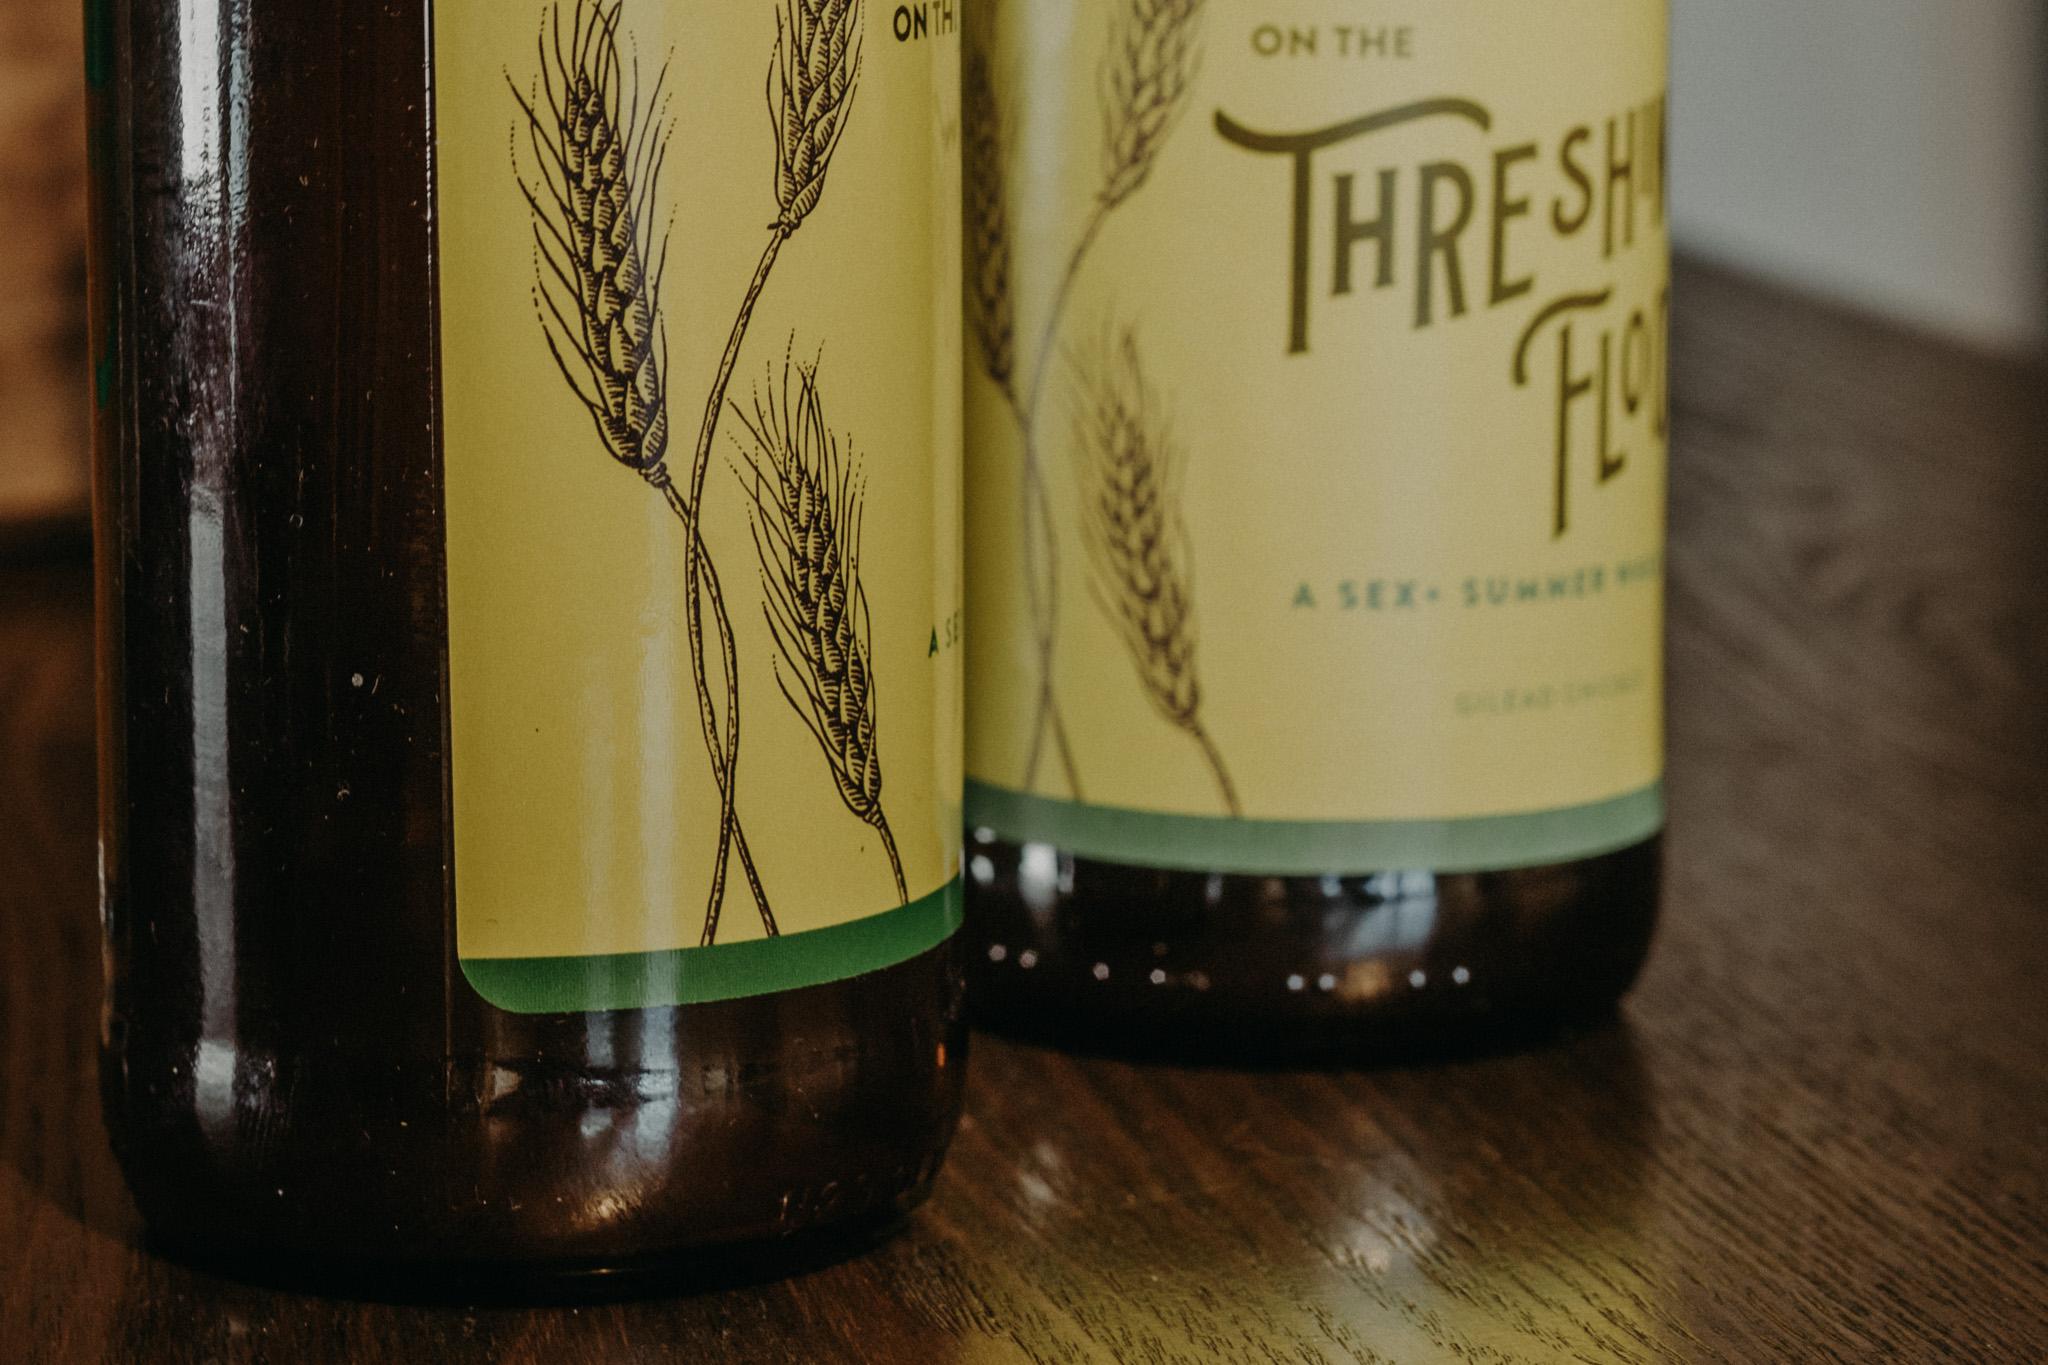 wheat beer label design